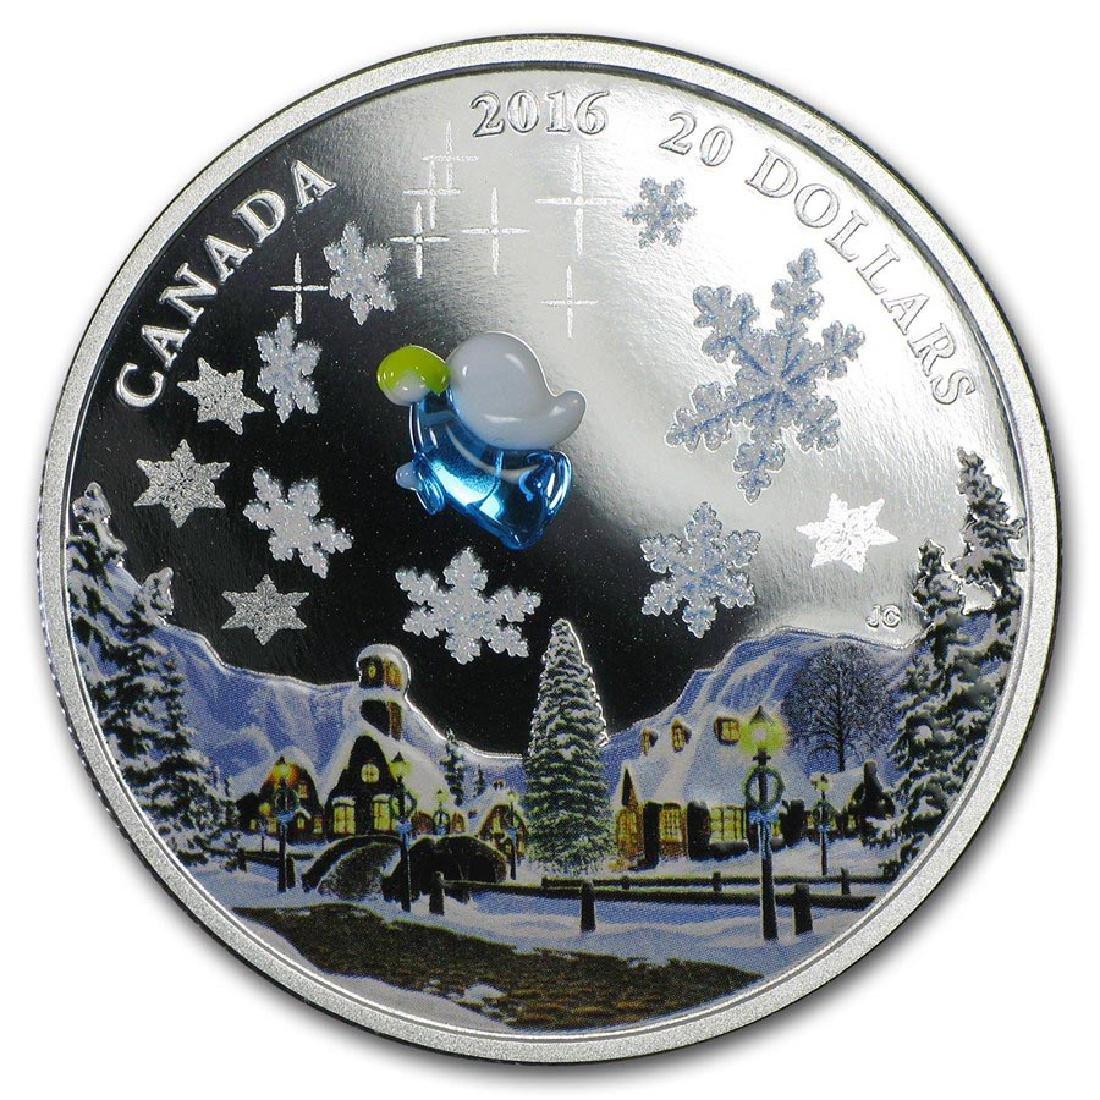 2016 Canada 1 oz Silver $20 Venetian Glass My Angel